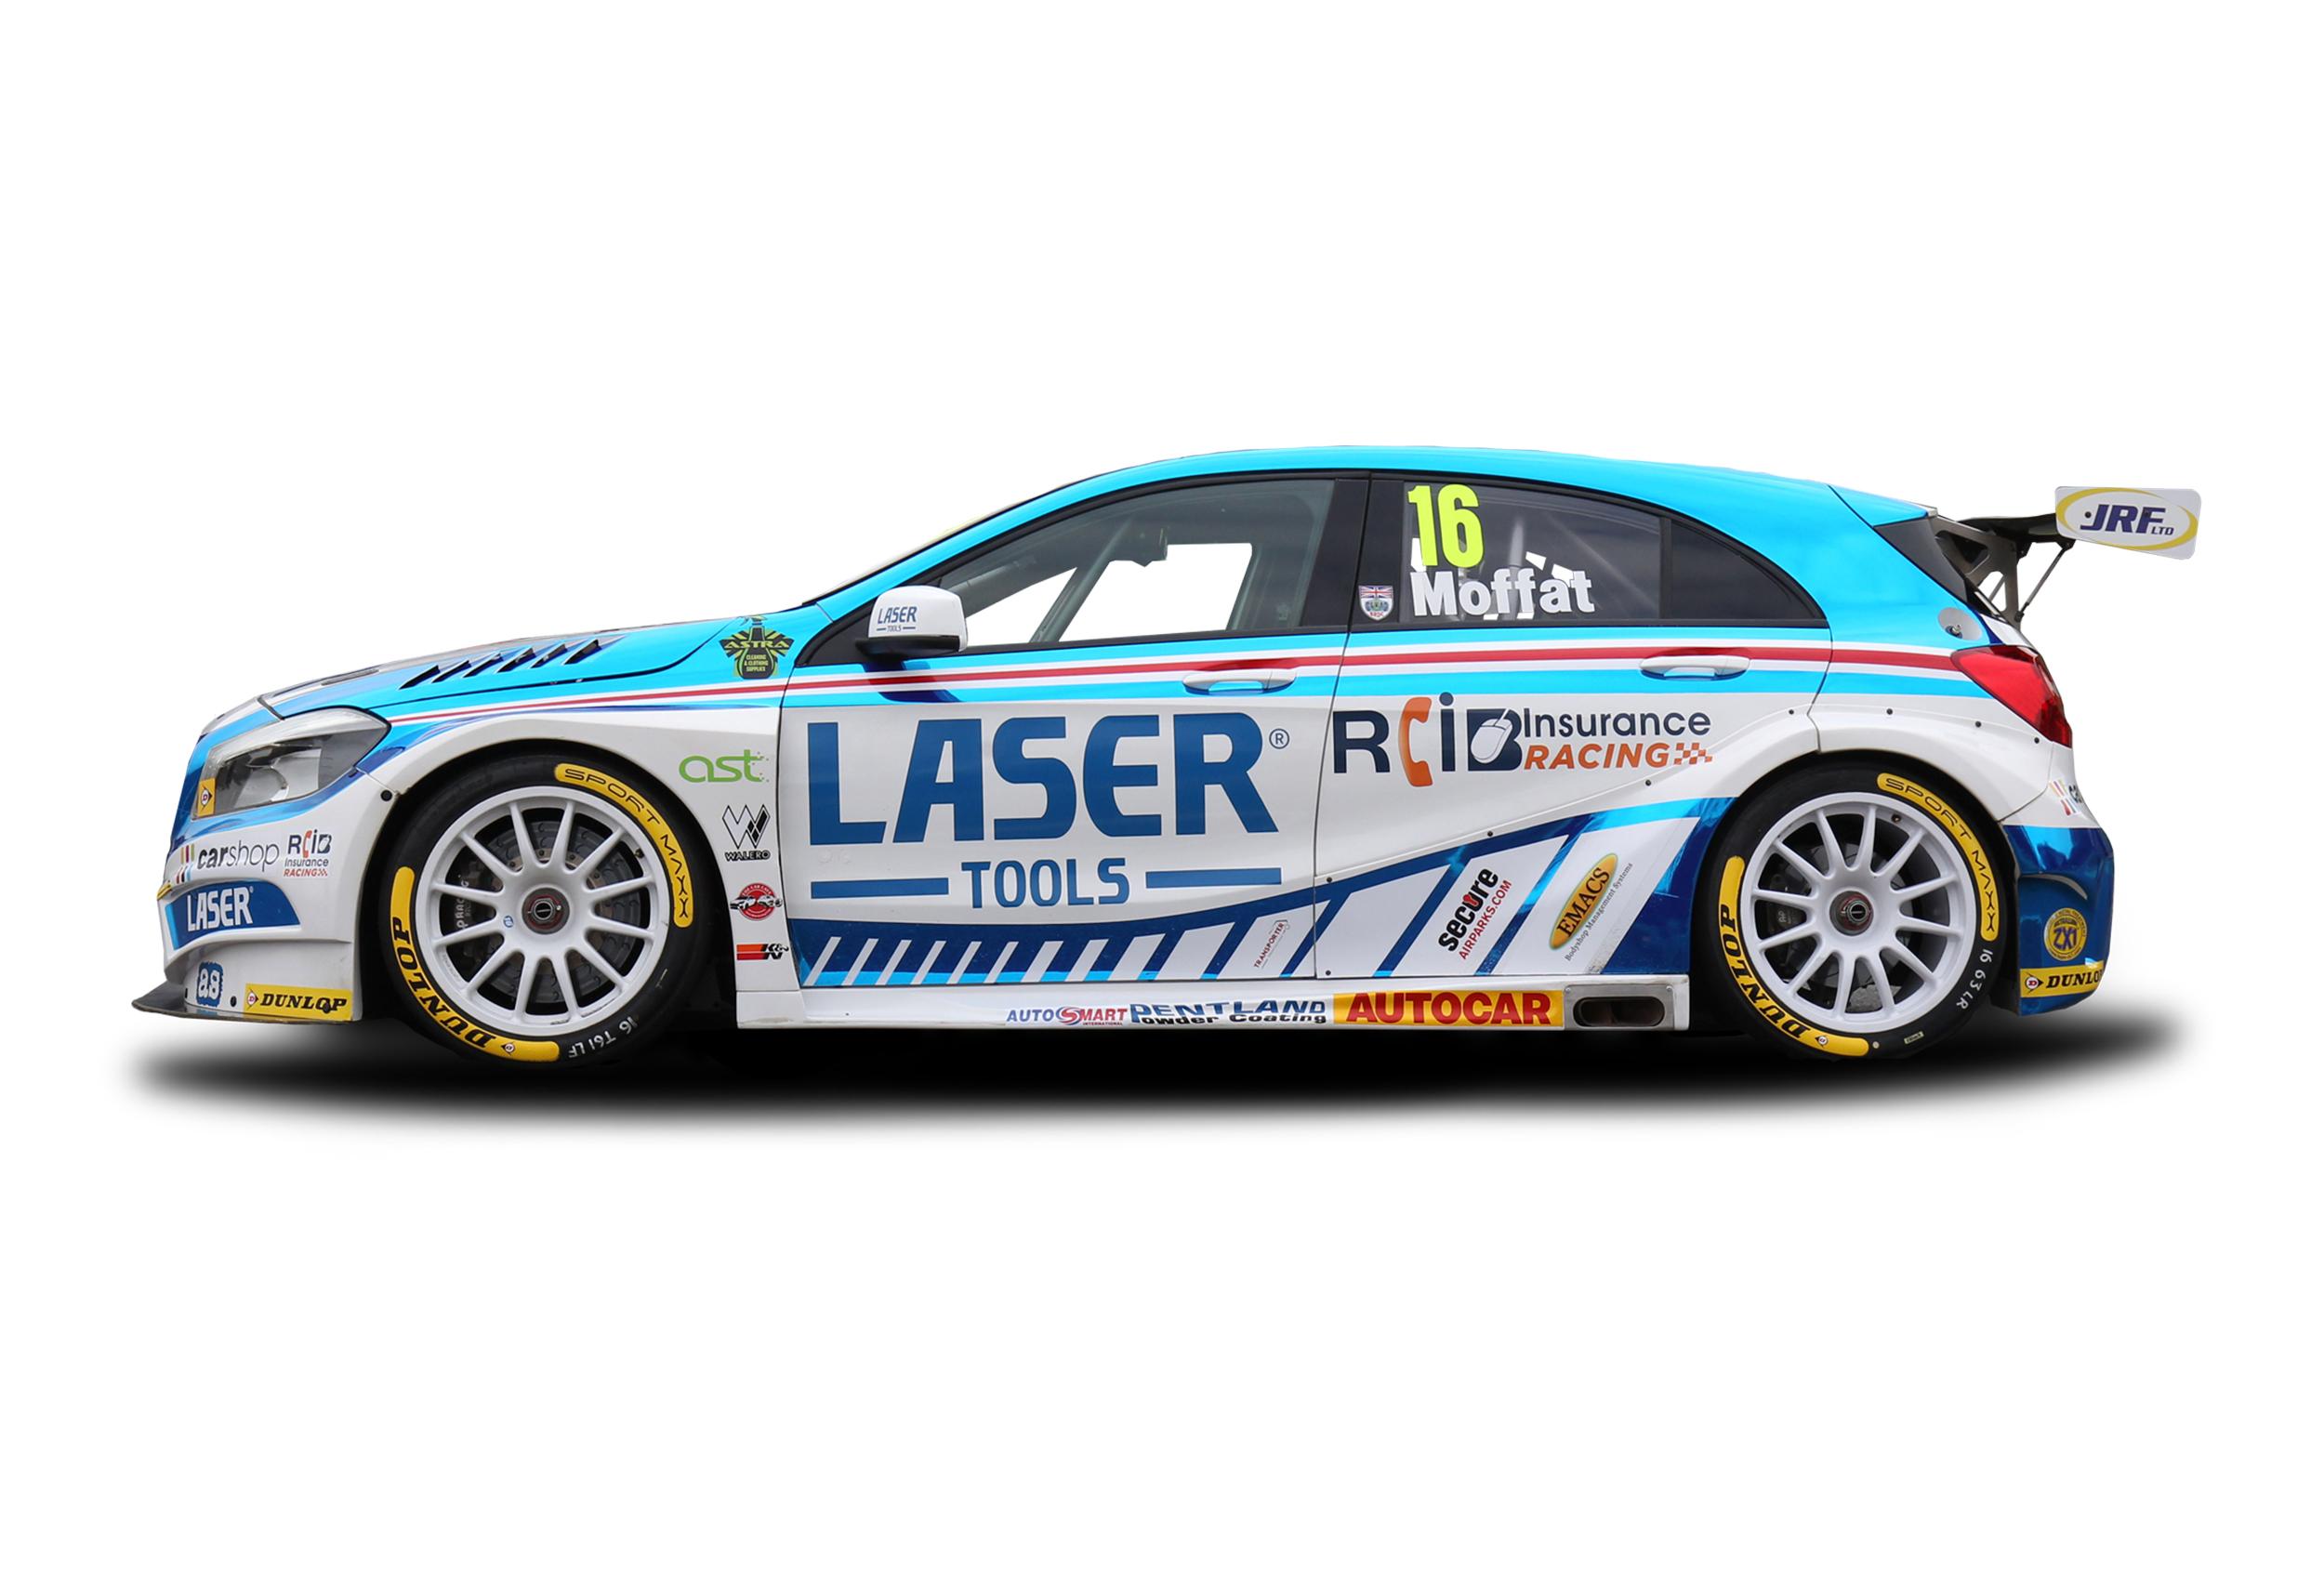 laser-tools-racing